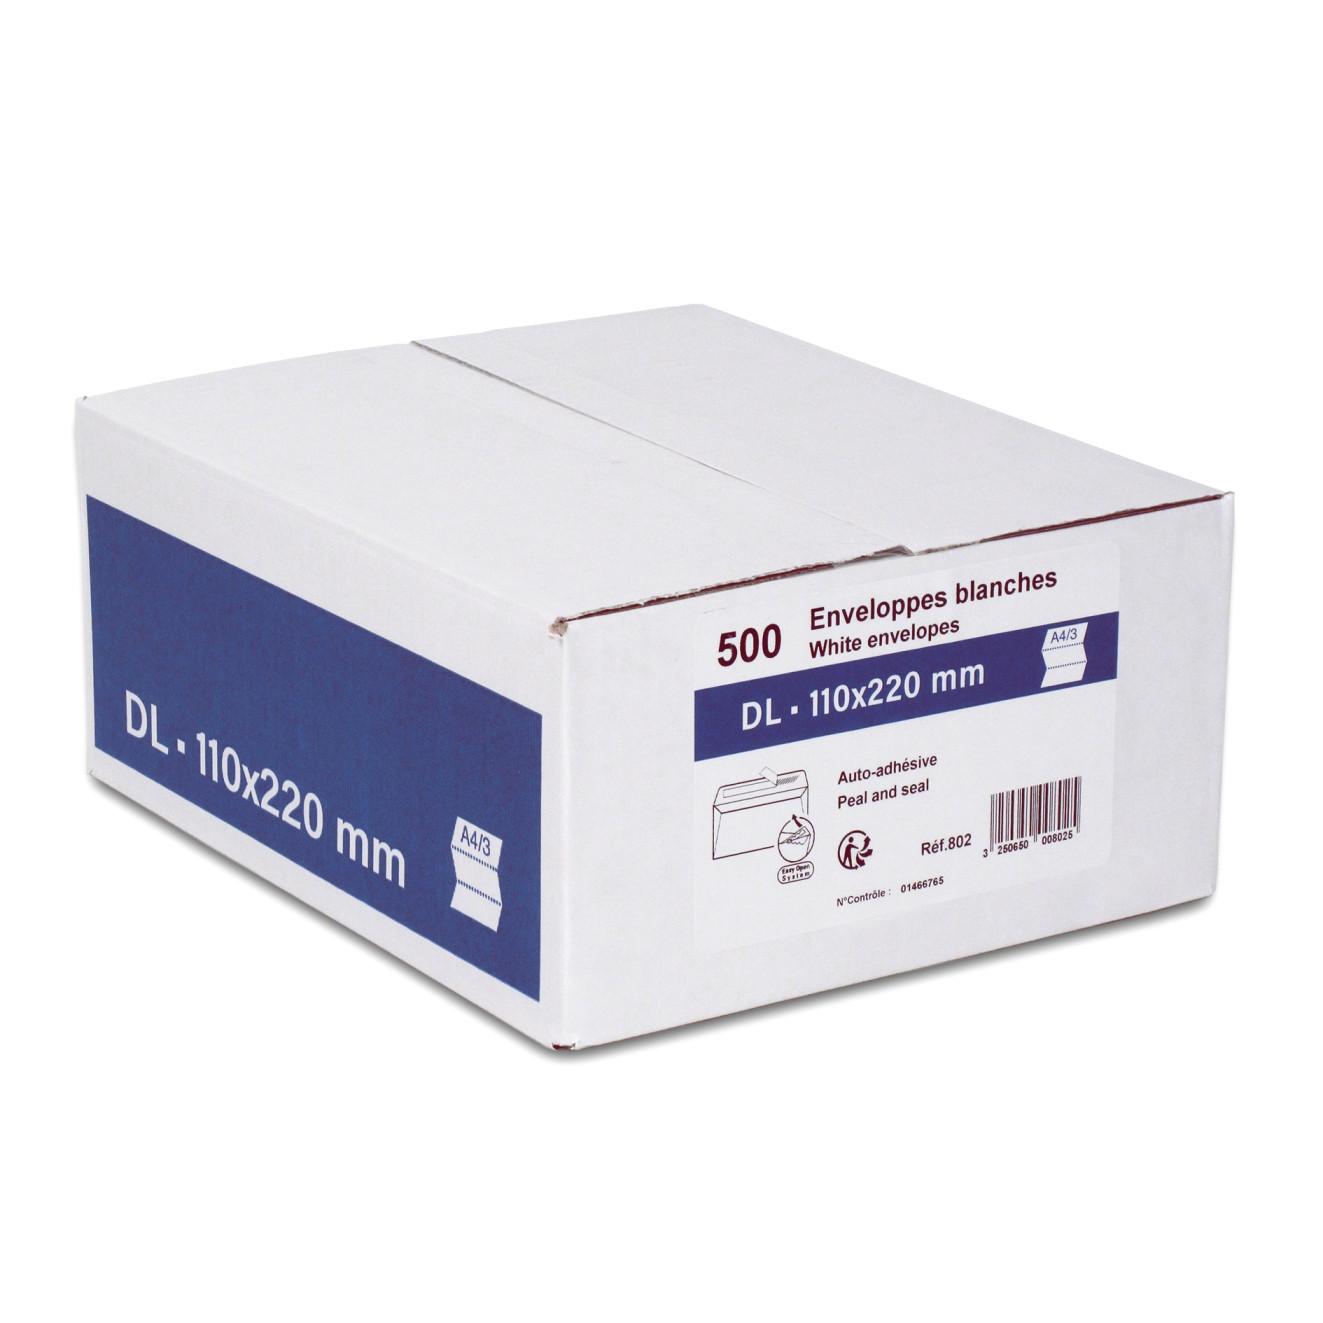 GPV - 500 Enveloppes DL 110 x 220 mm - 80 gr - sans fenêtre - blanc - bande adhésive